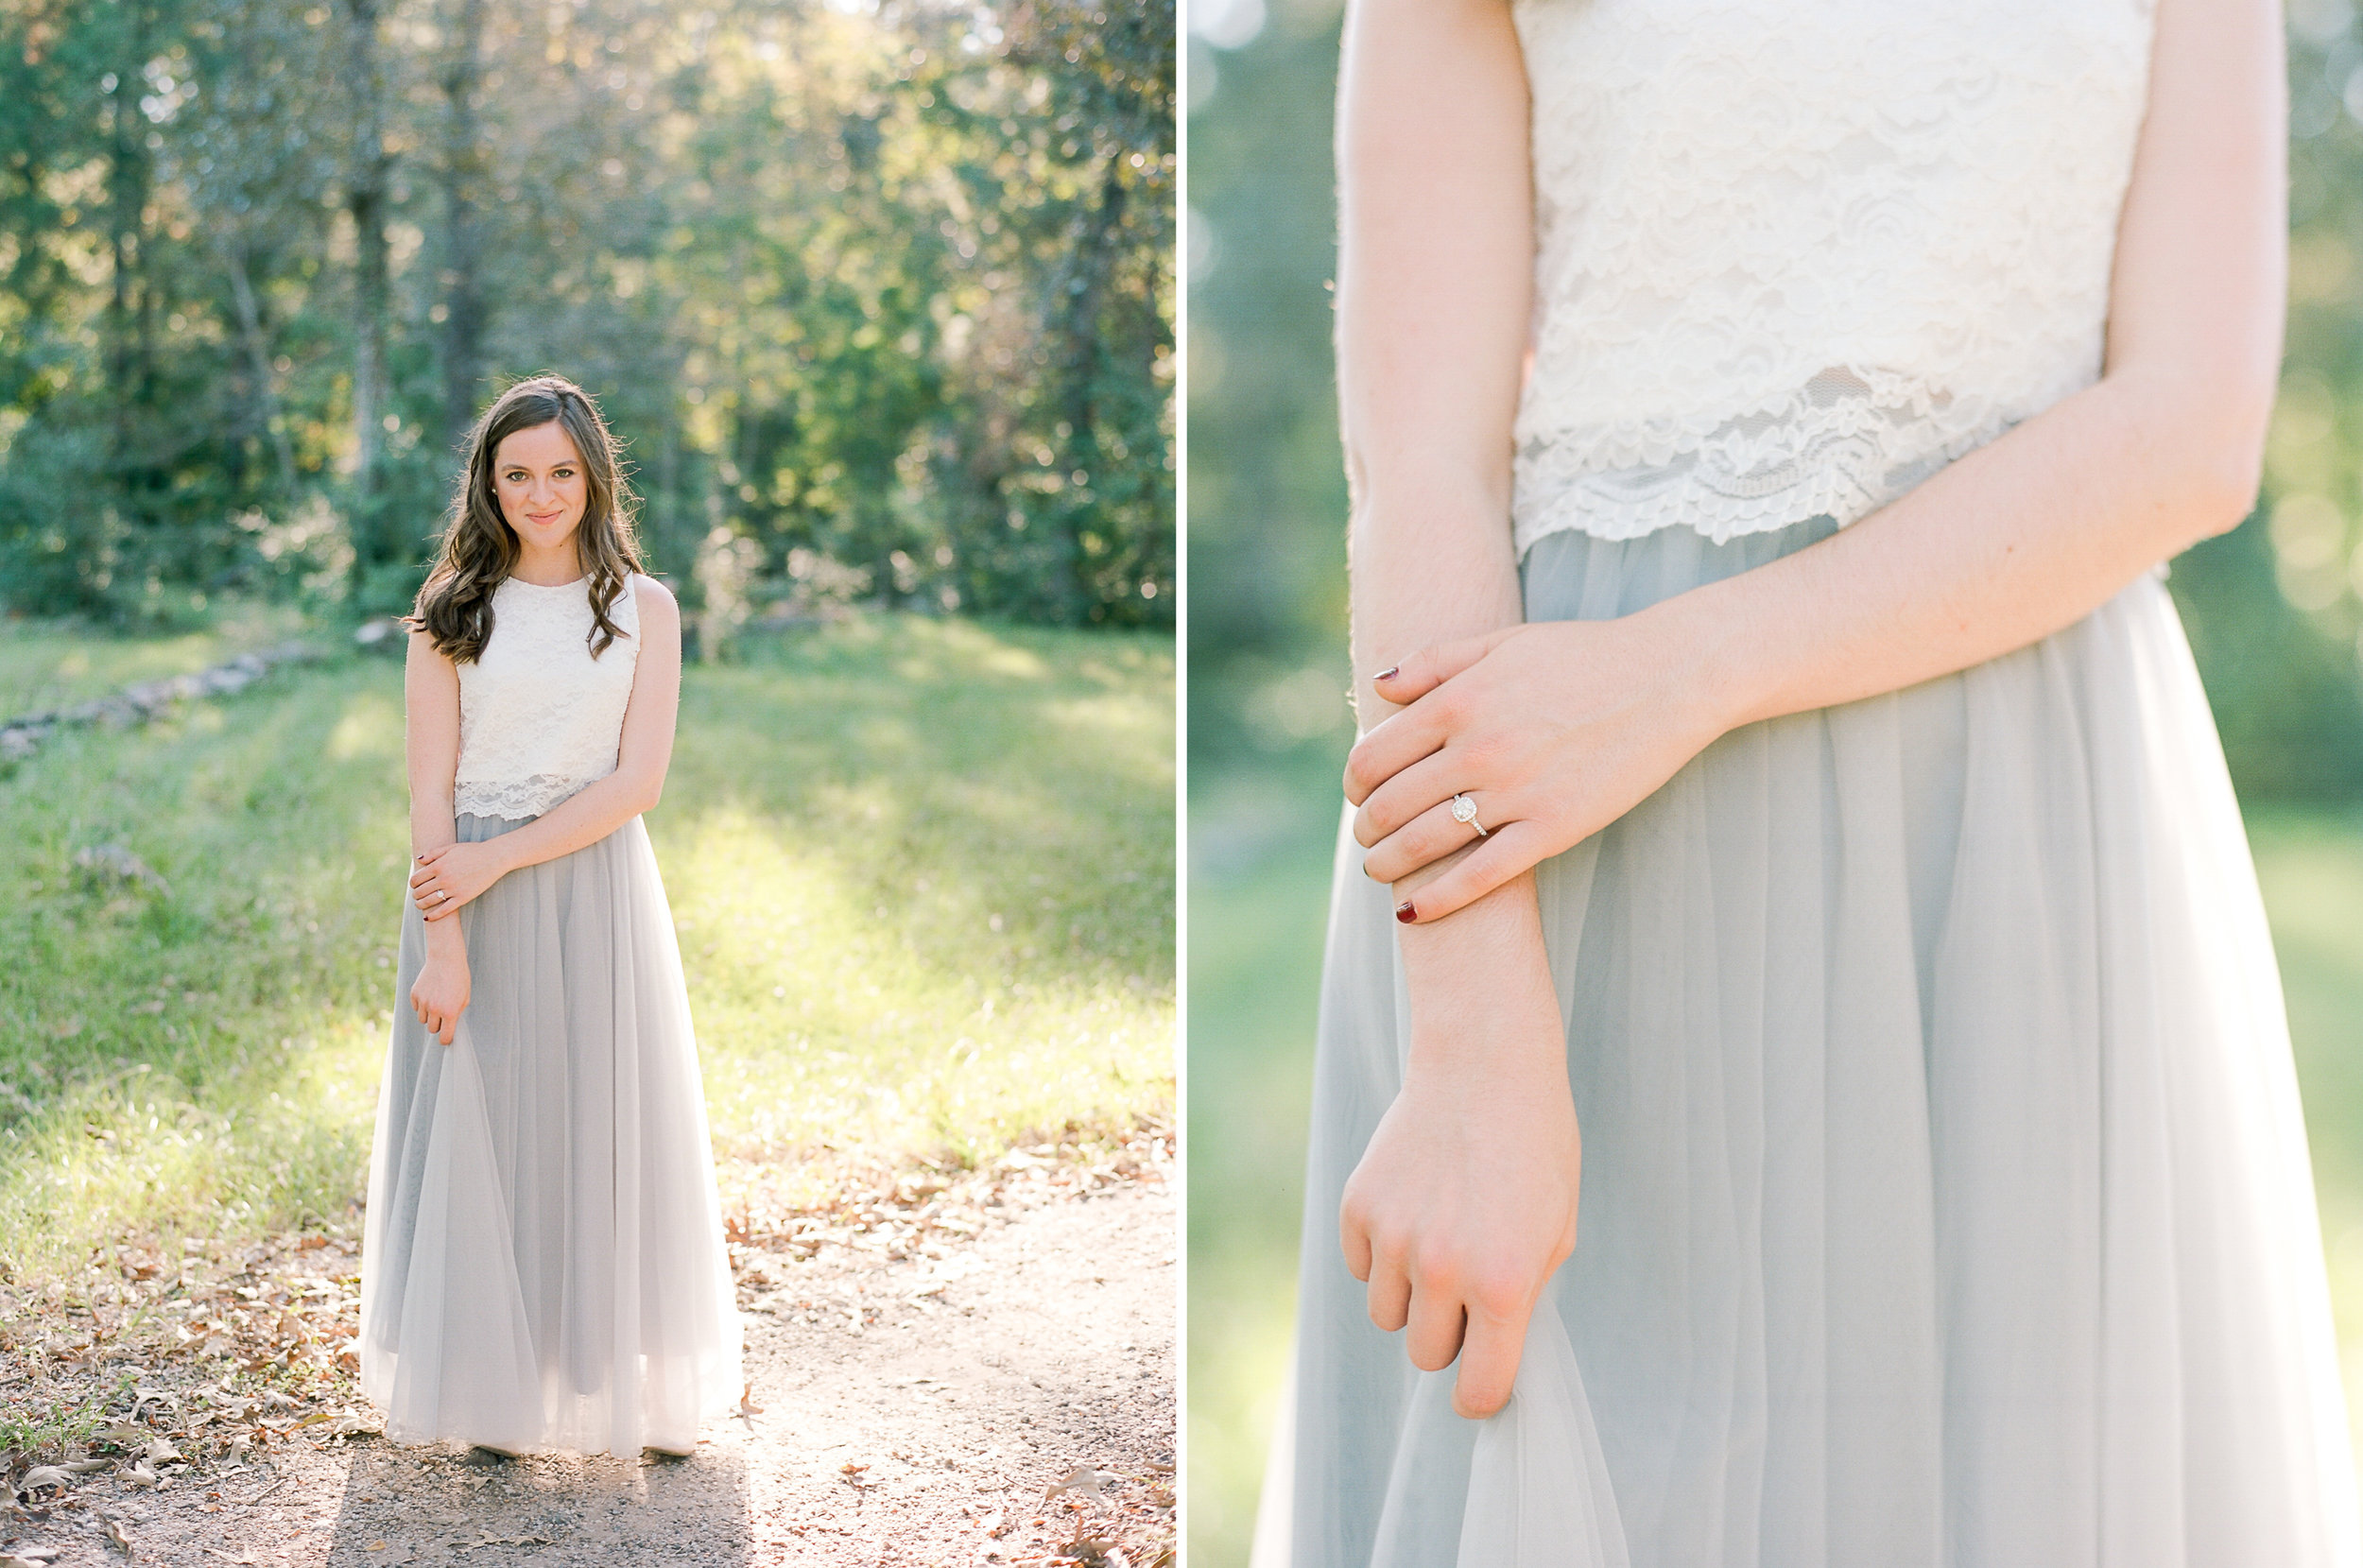 houston-wedding-photographer-college-station-austin-the-woodlands-film-photography-style-me-pretty-engagements-dana-fernandez-photography.jpg